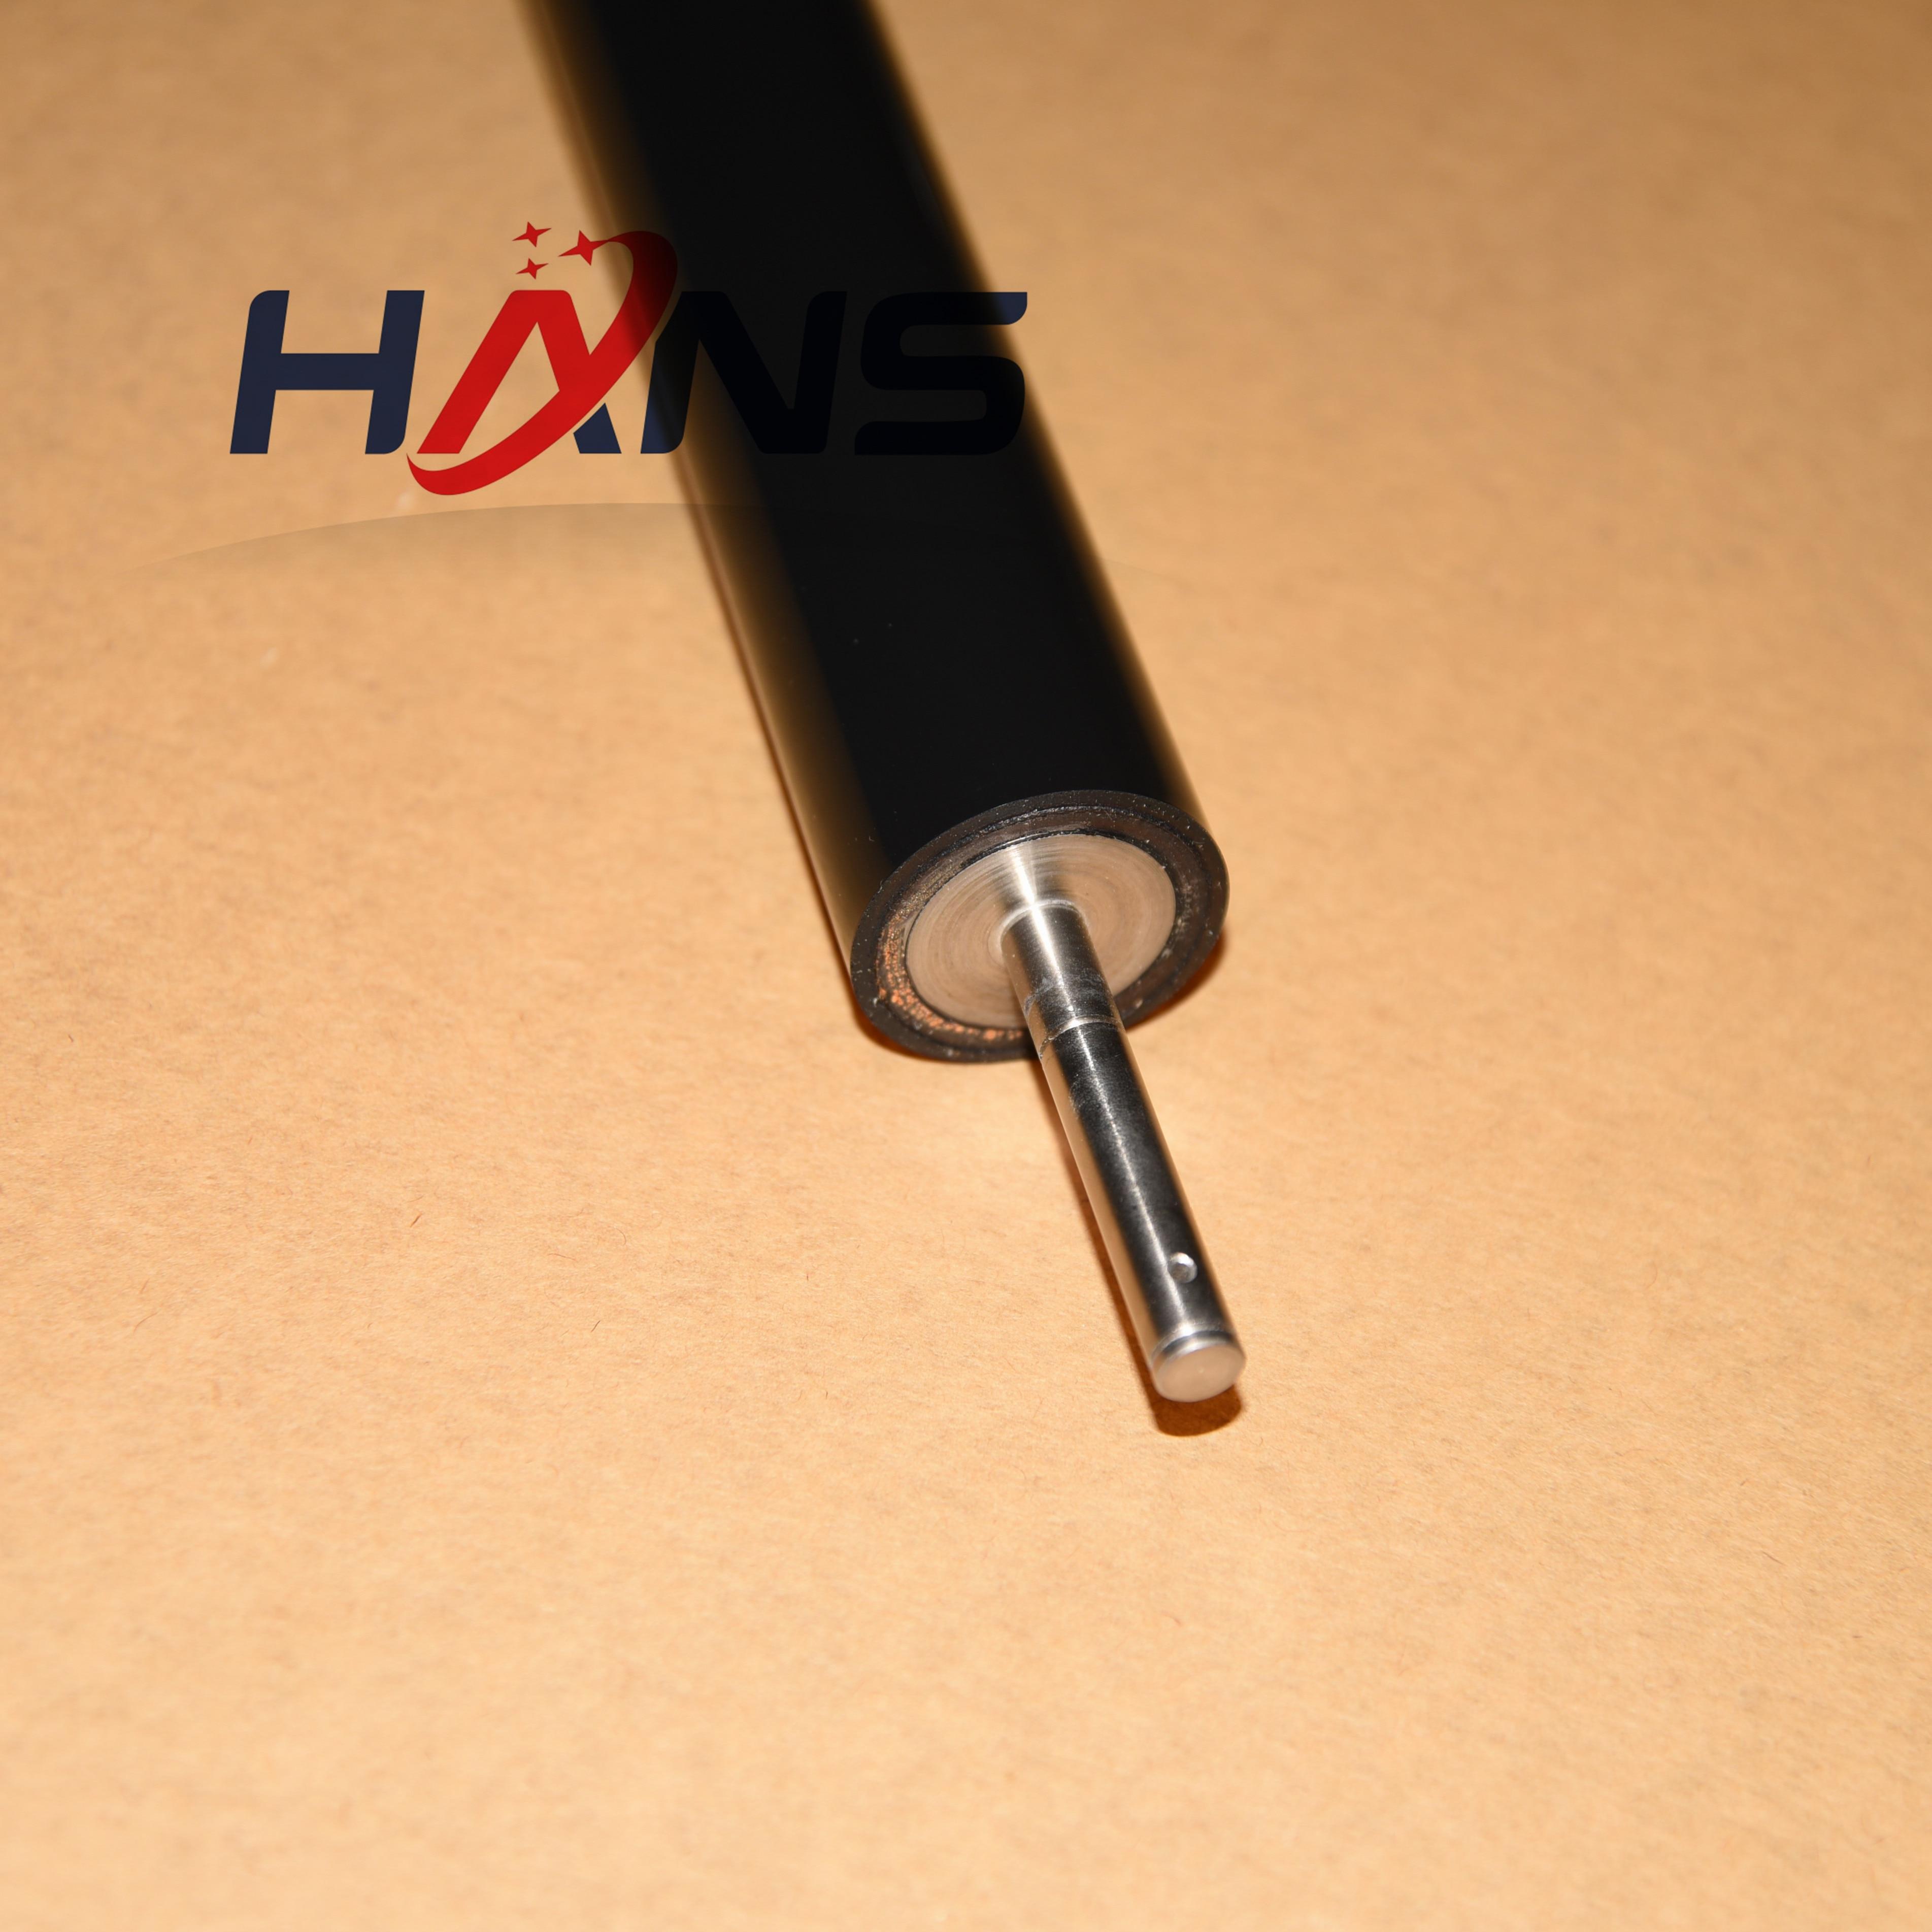 1pc For Konica Minolta Bizhub C454 C454e Lower Sleeved Fuser Roller High Quality A4FJR70300 Lower Pressure